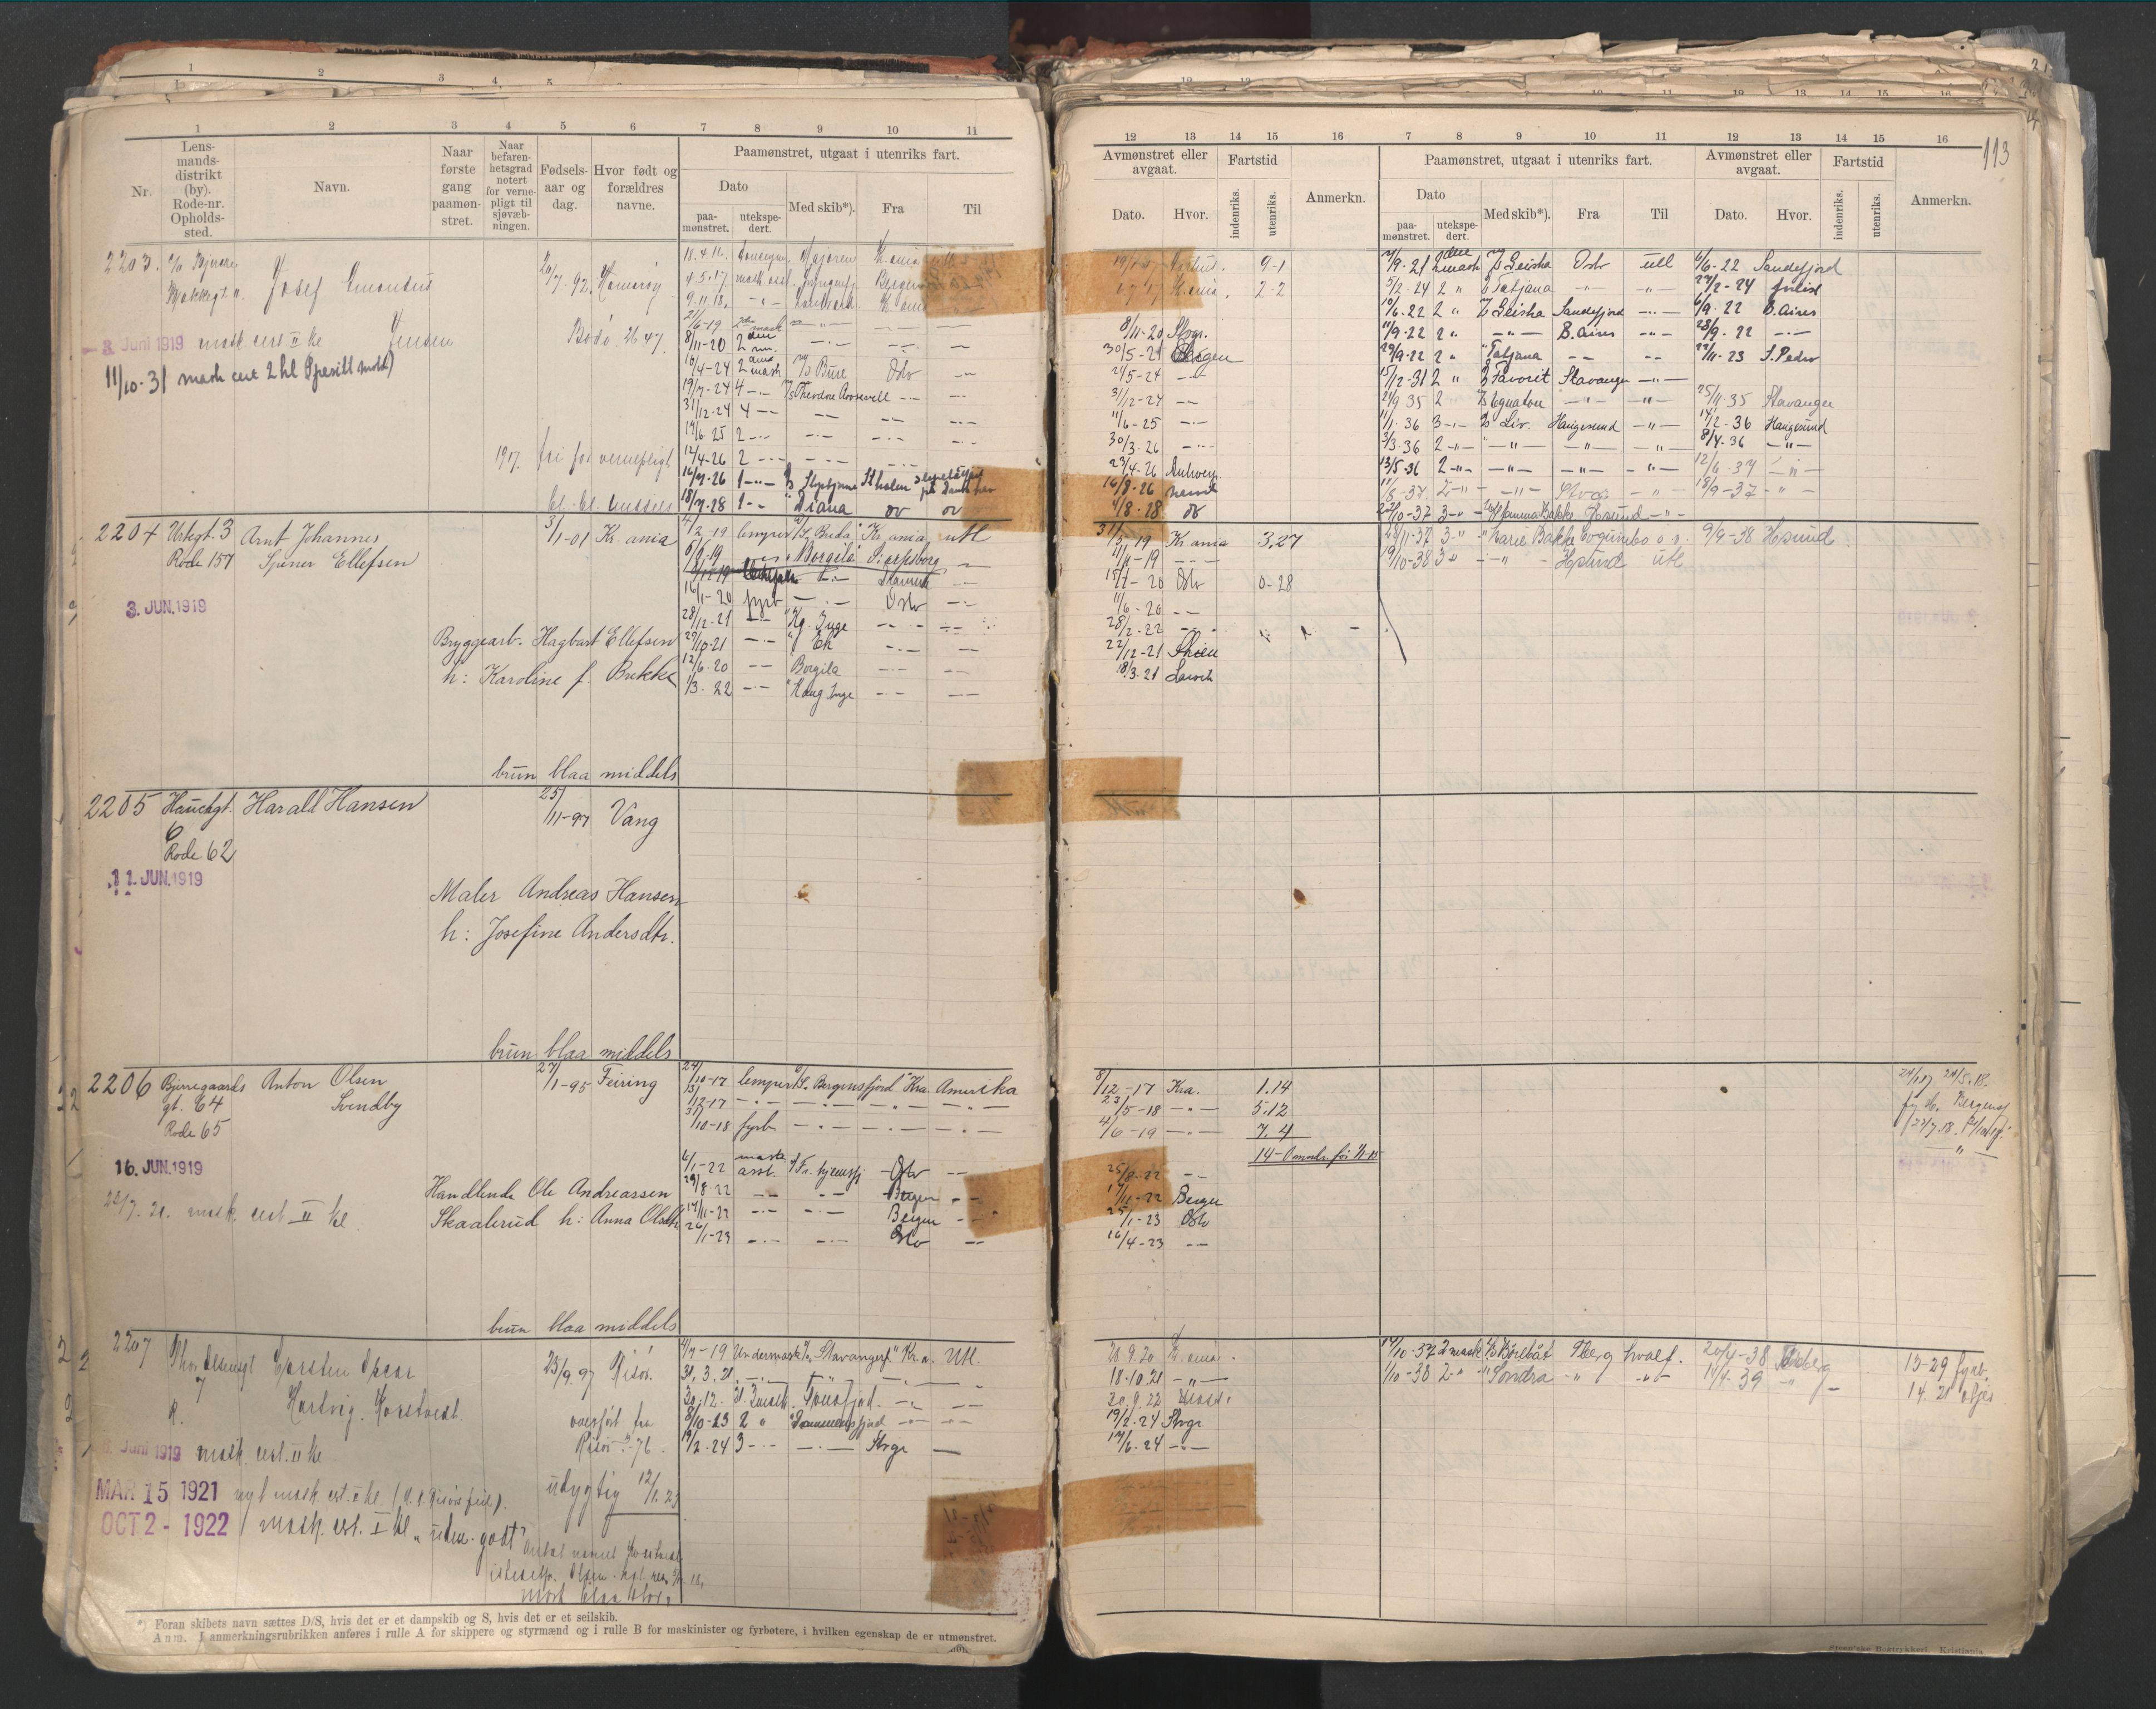 SAO, Oslo sjømannskontor, F/Fd/L0003: B-rulle, 1916, s. 112b-113a